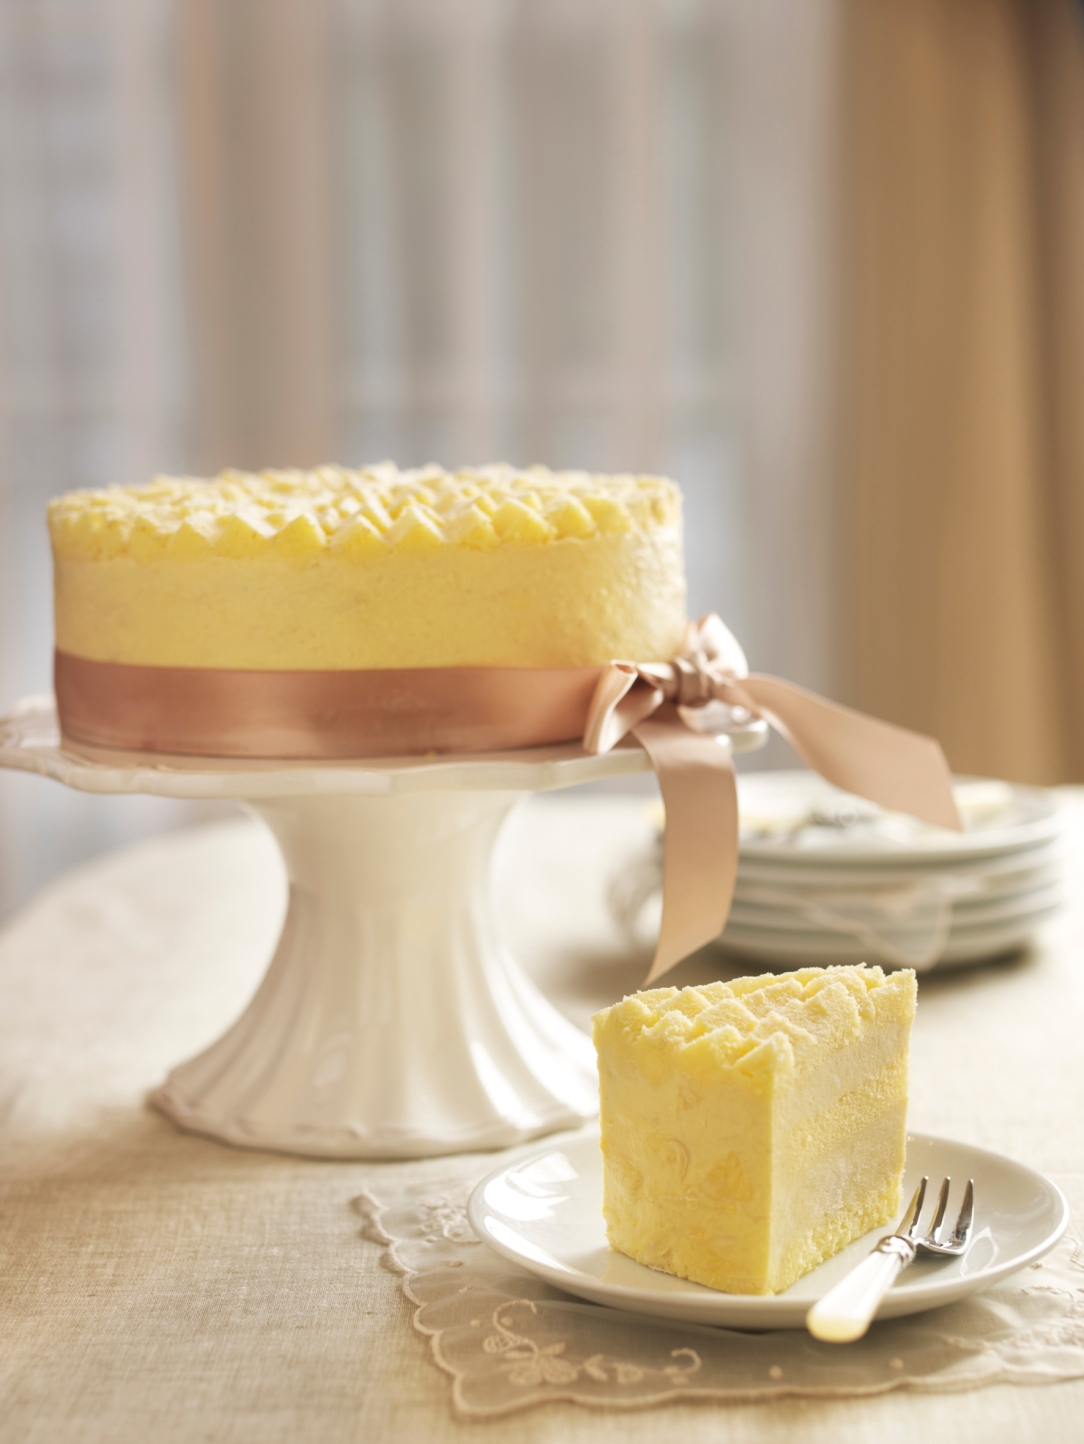 Goodwood Park Hotel D24 Durian Mousse Cake